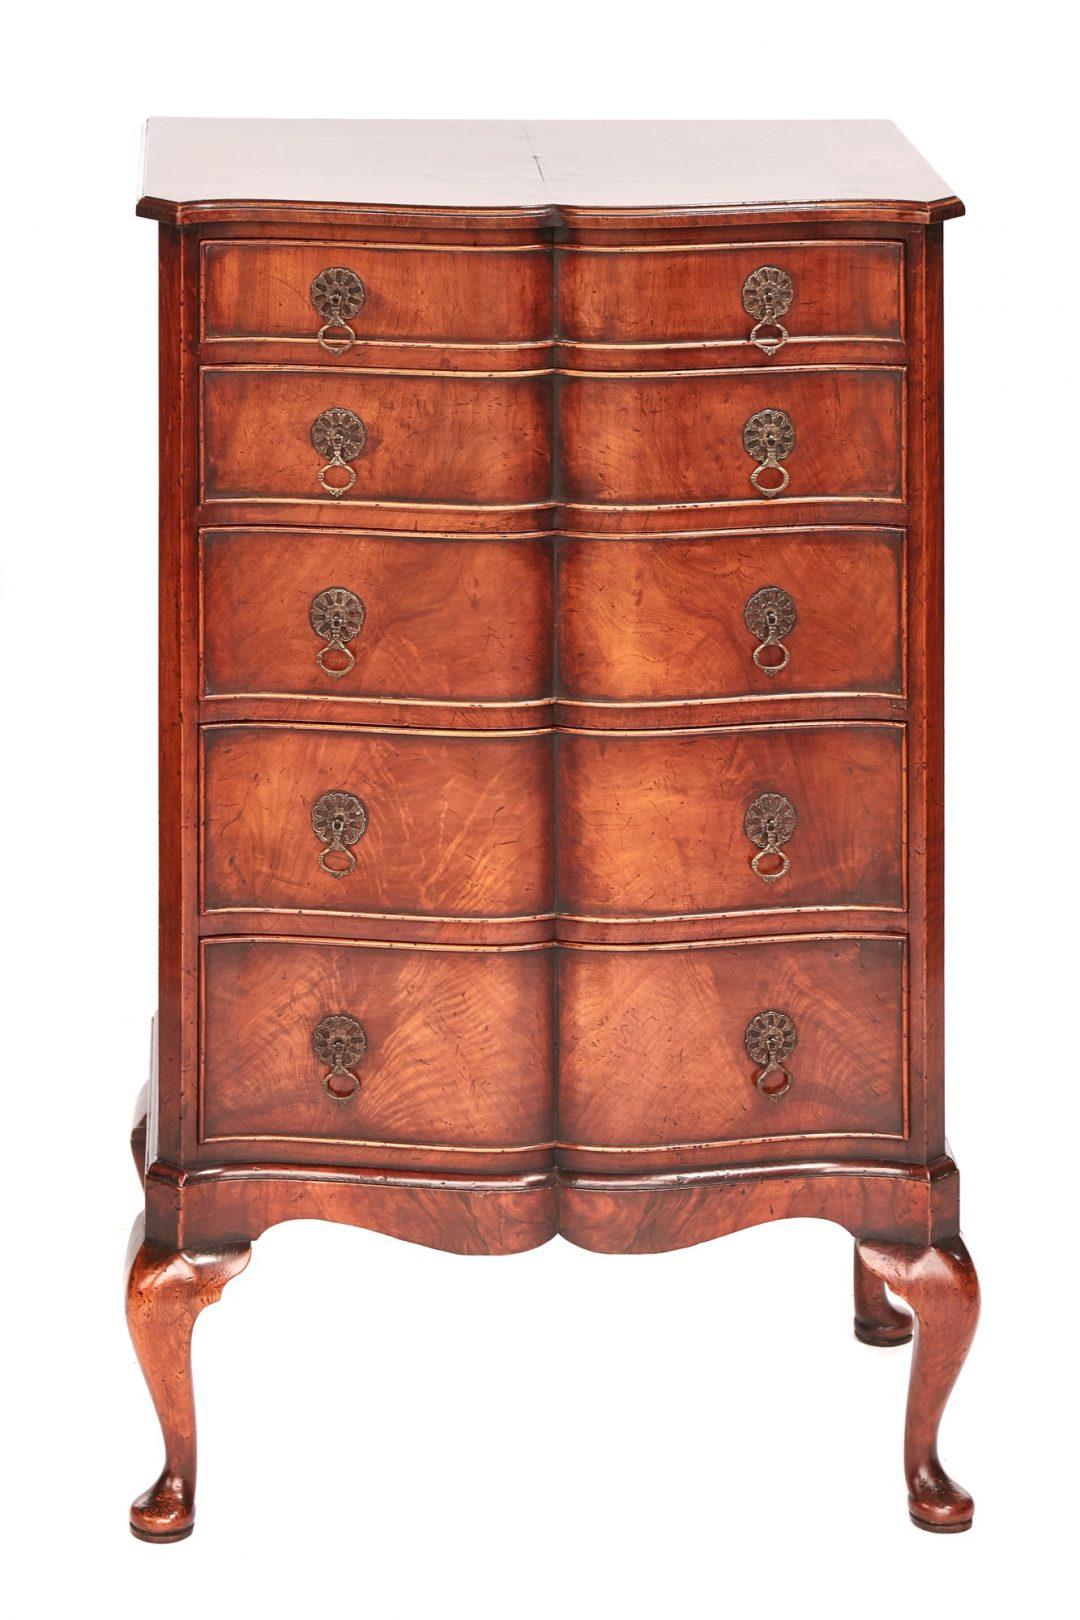 Georgian style walnut chest circa 1920s